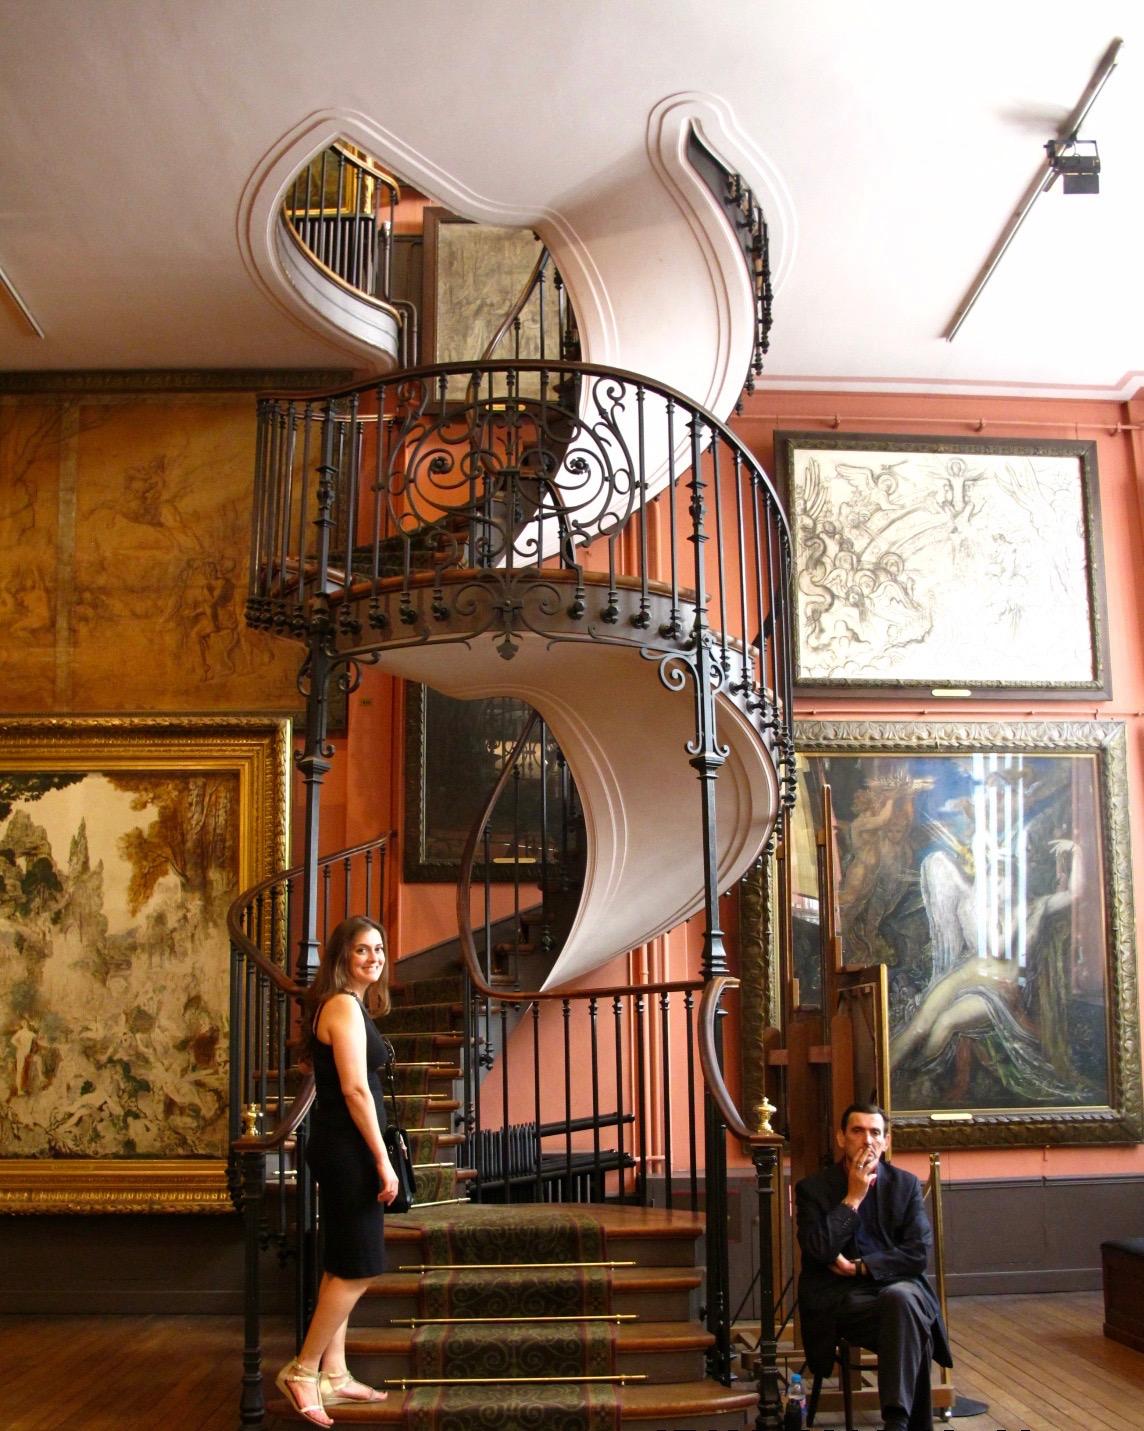 Musée Gustave Moreau, Paris | Karoliina Kazi